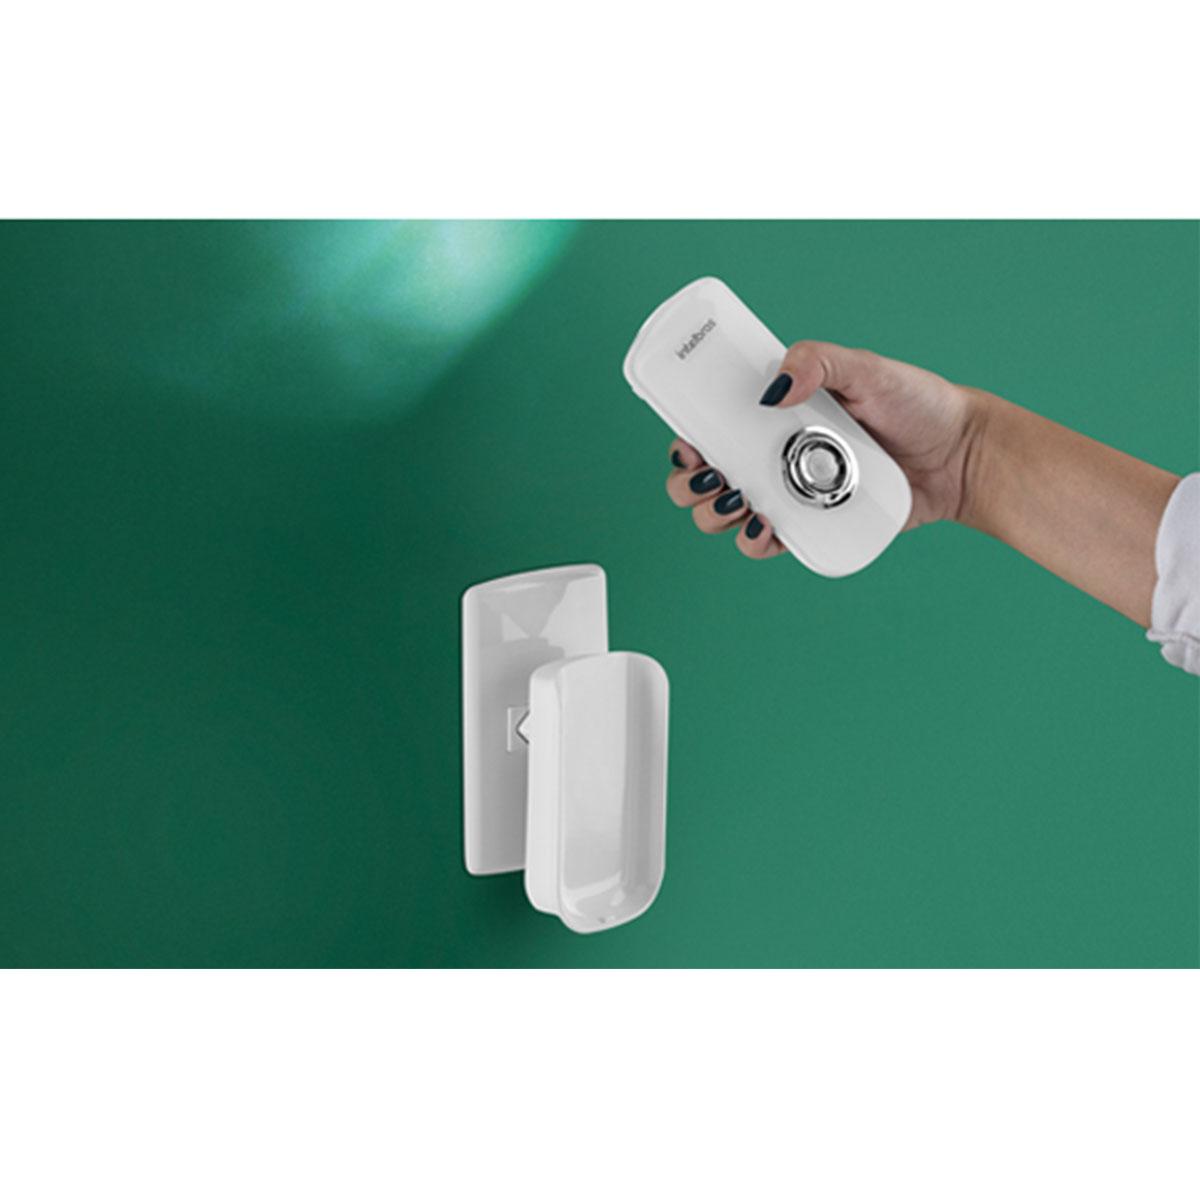 Kit 4 Luminária Intelbras Led c/ Sensor De Presença Esi 5003